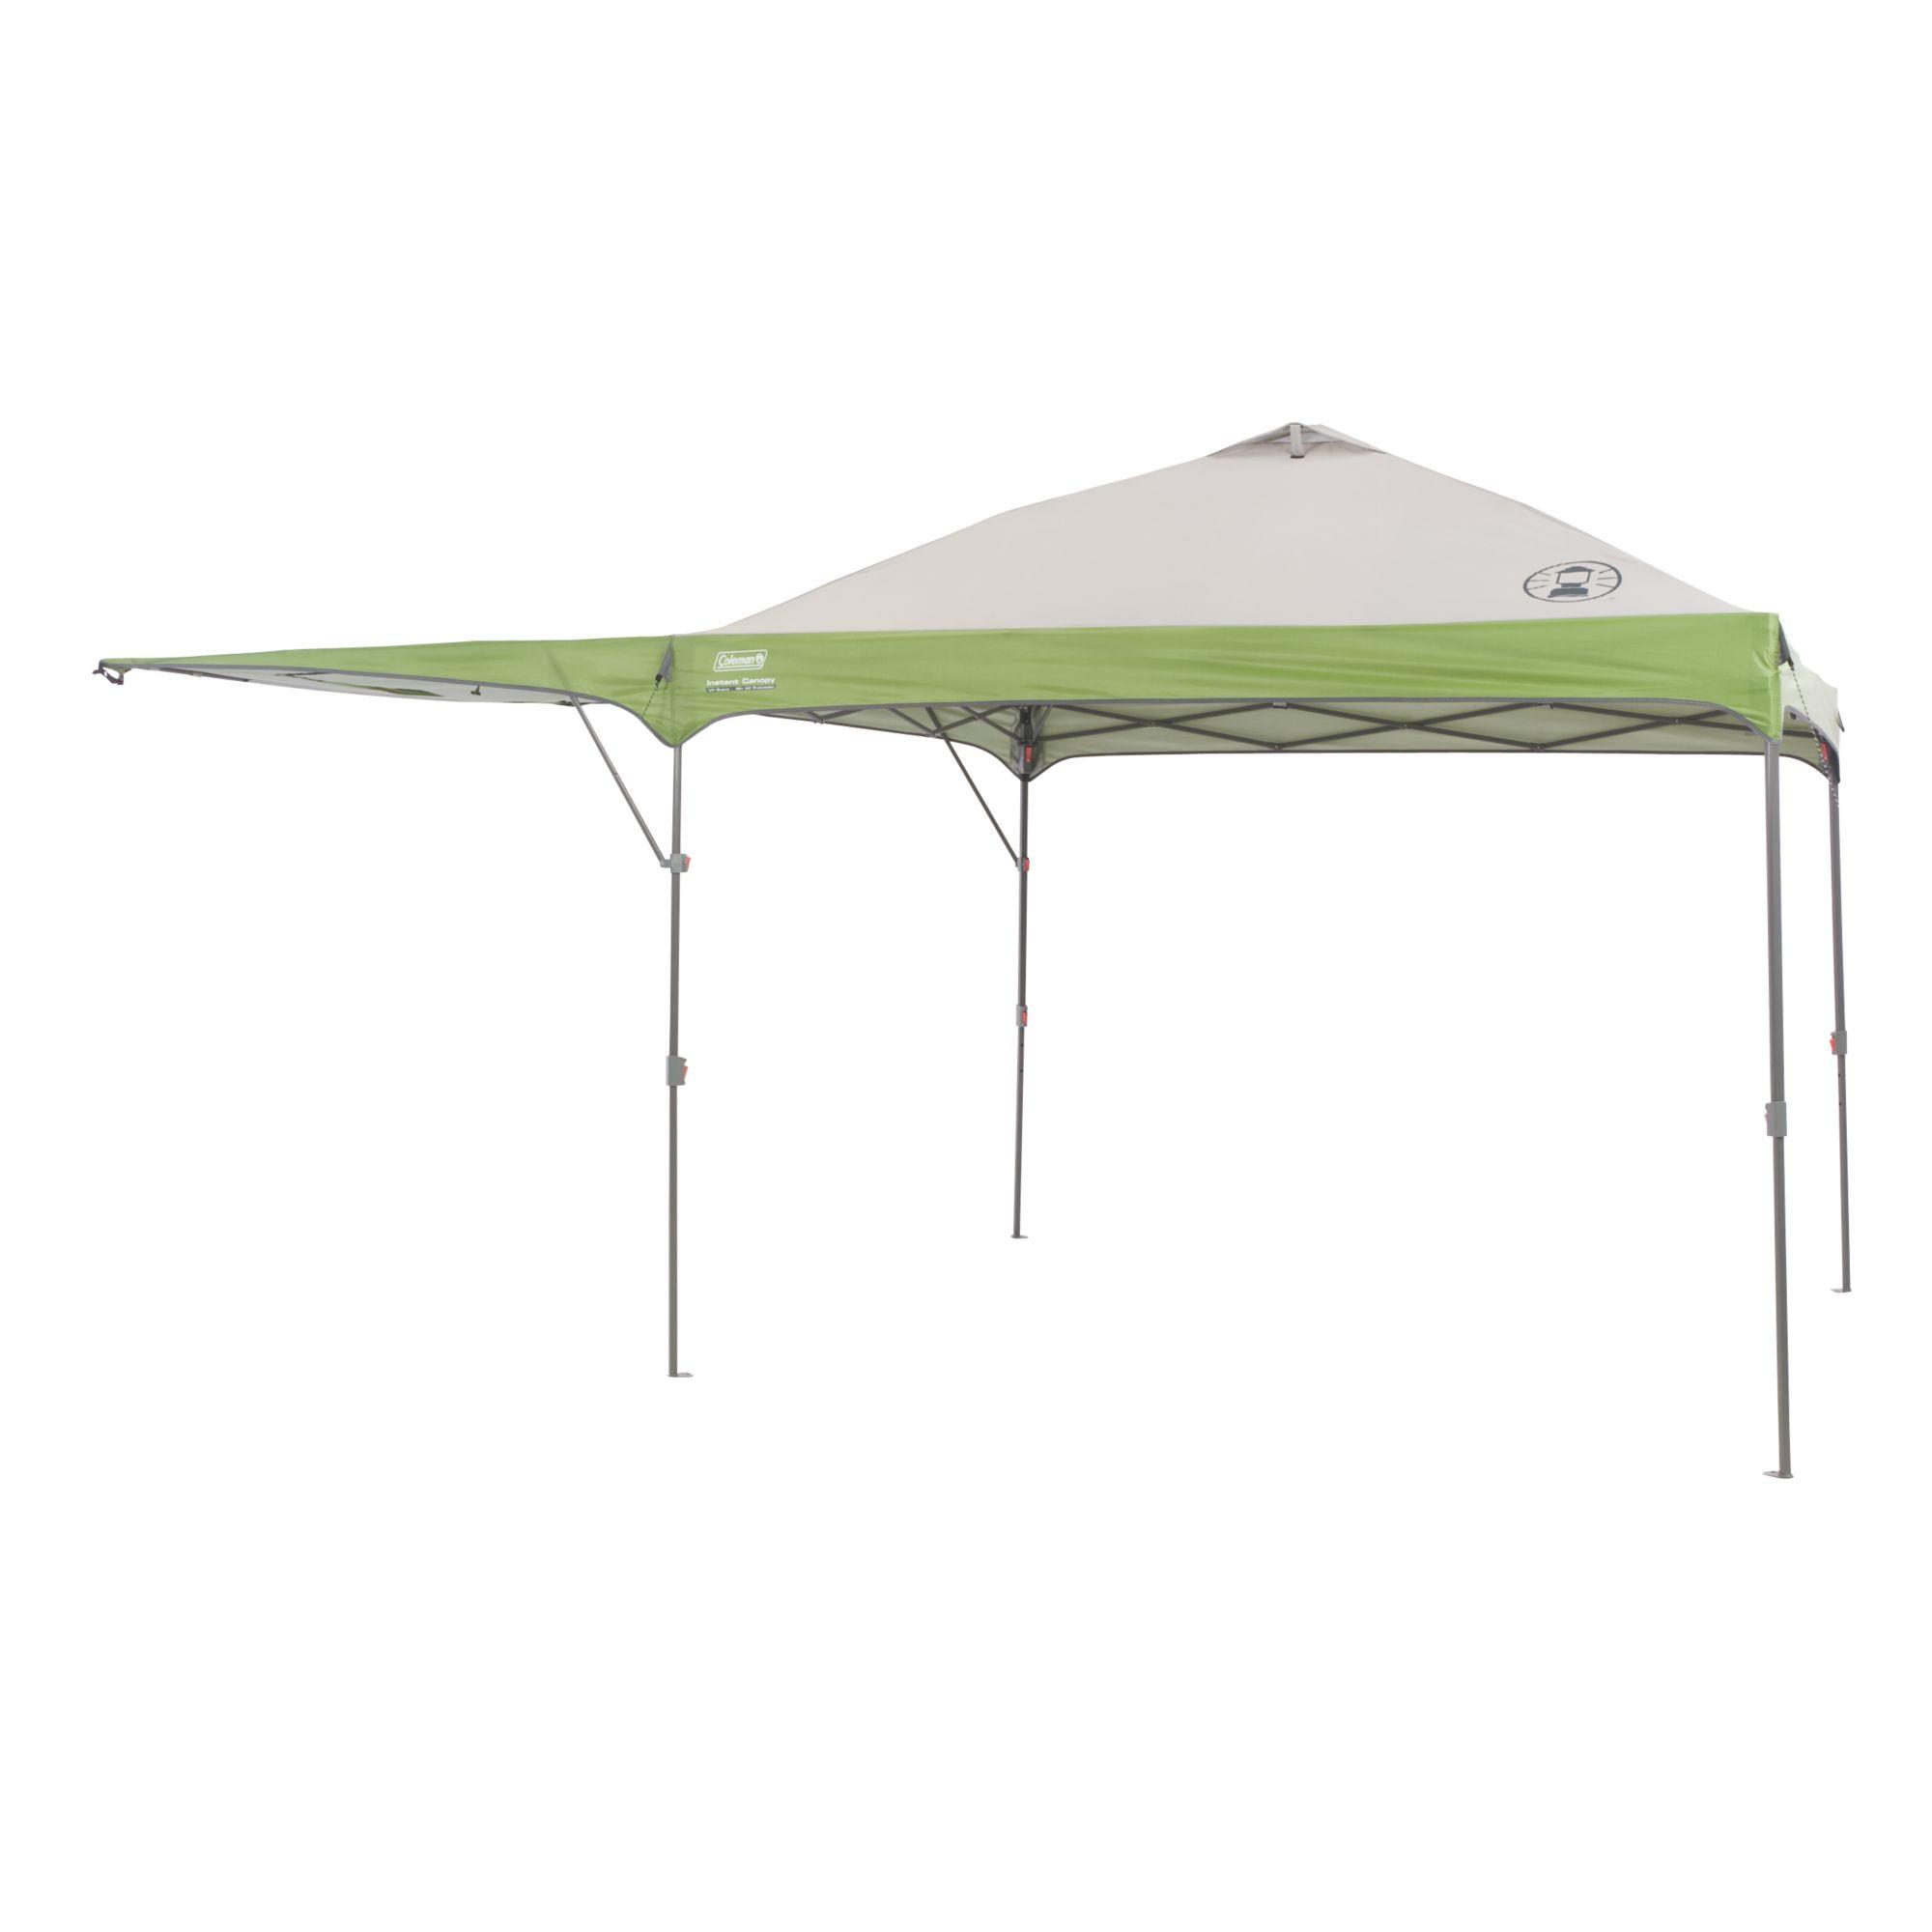 Swingwall Instant Canopy